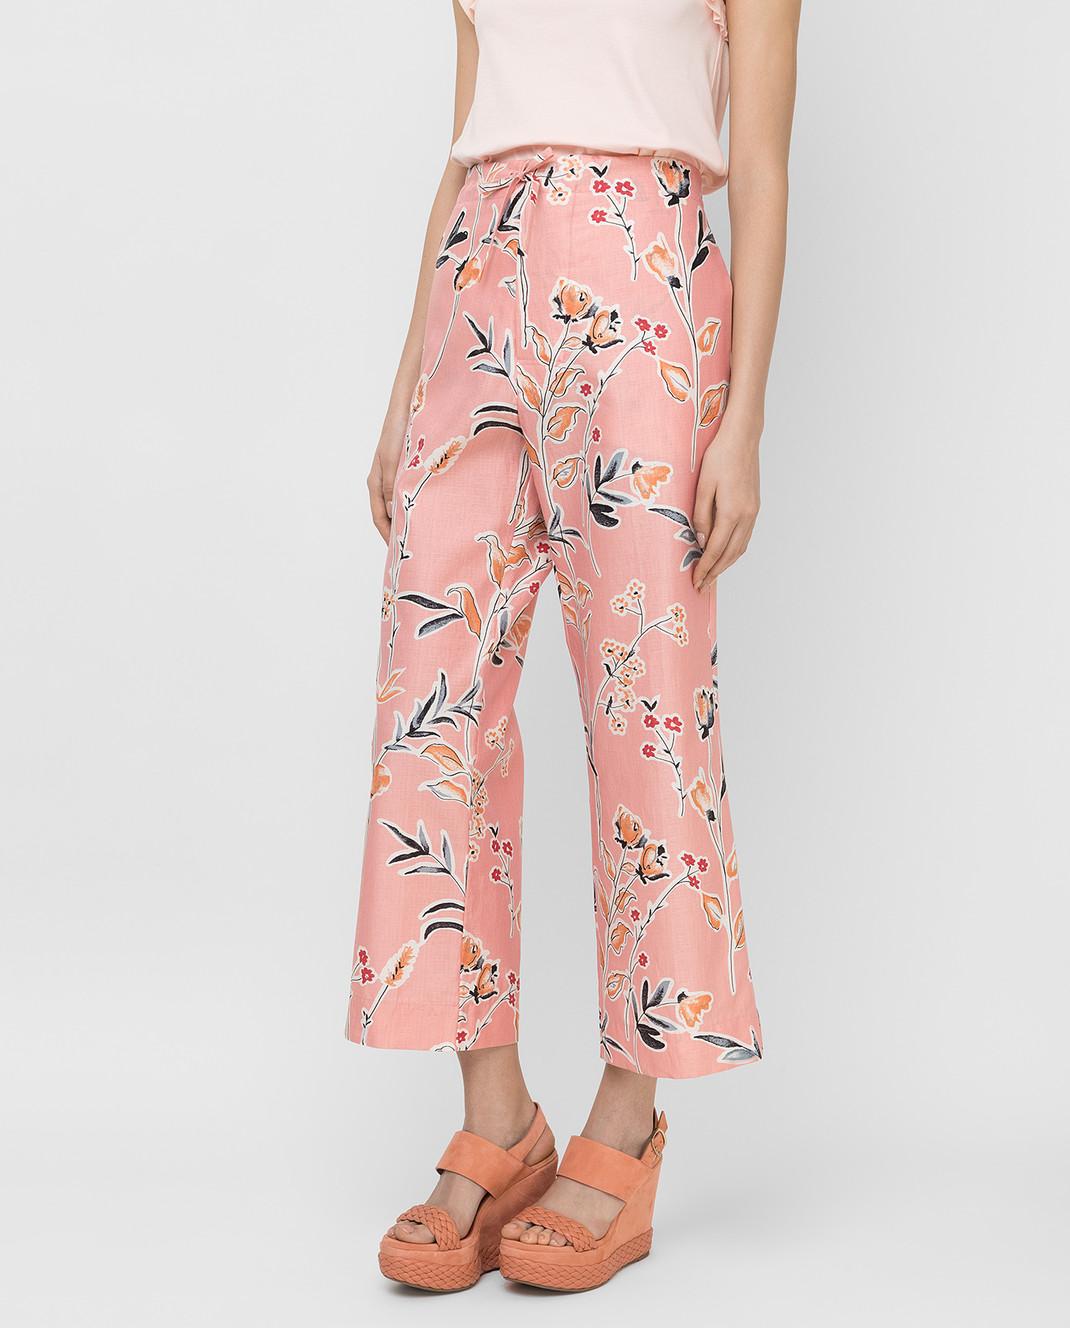 Marni Розовые брюки PAMAR02A00TCR58 изображение 3